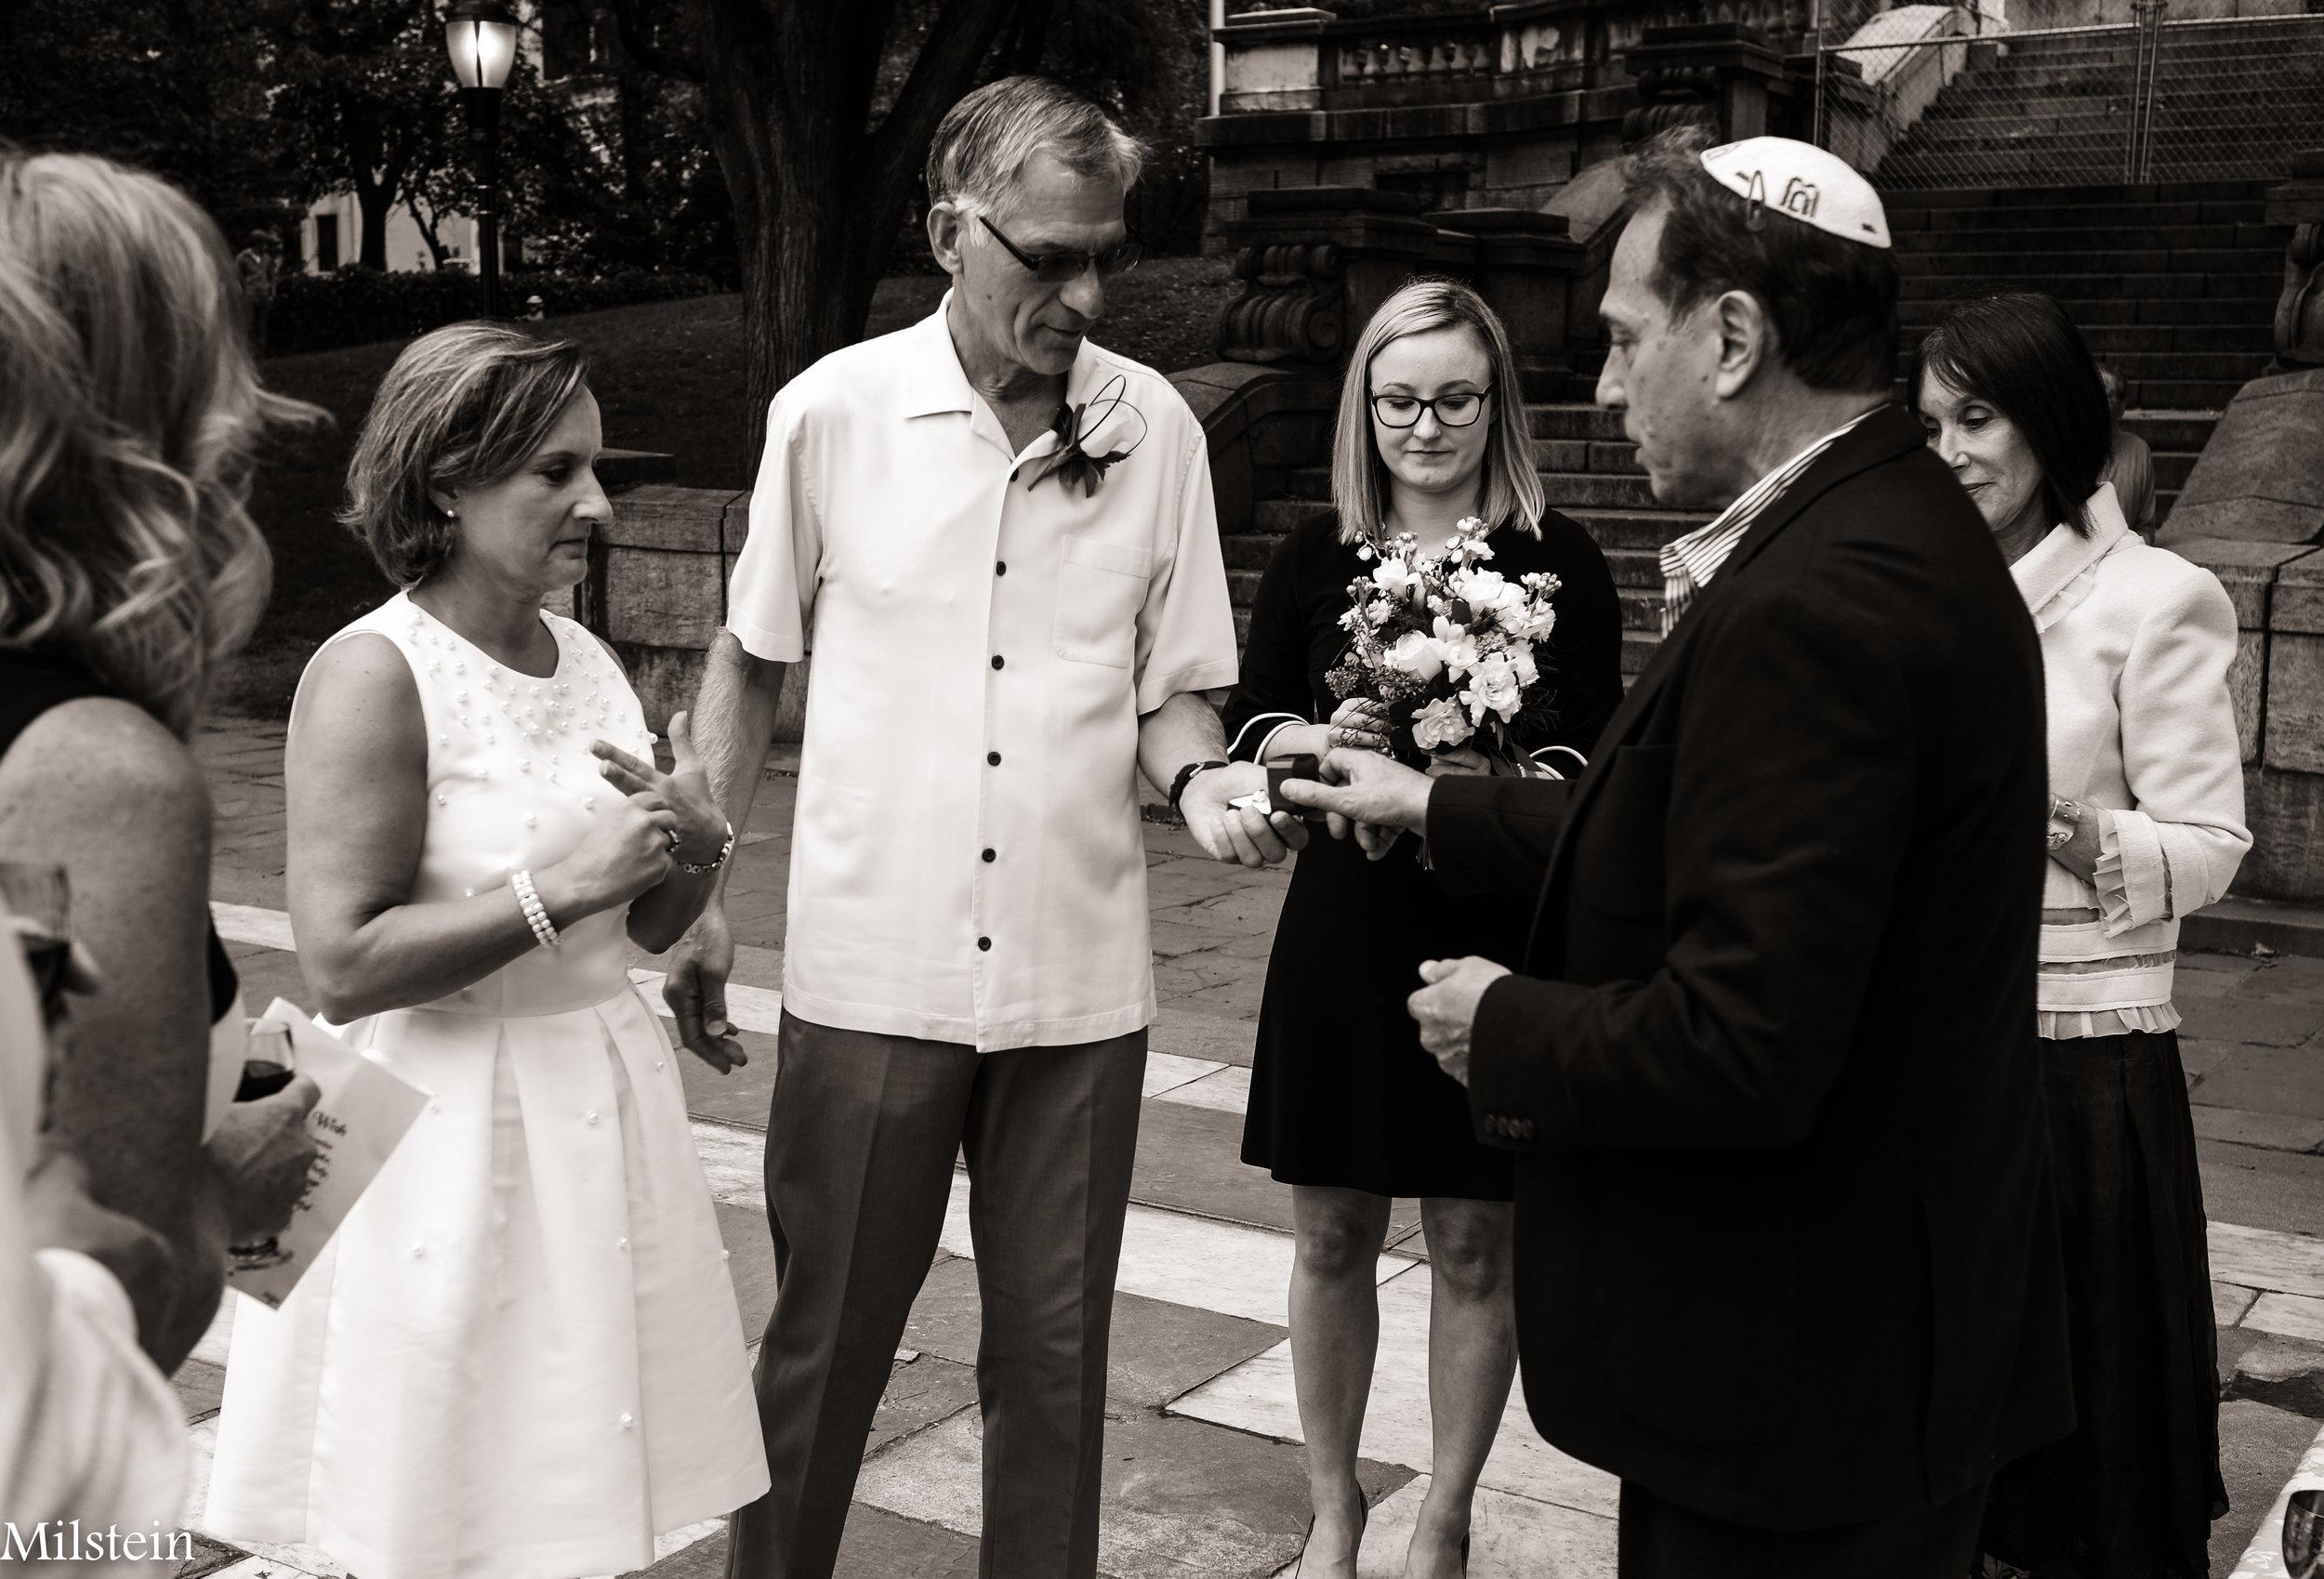 Amy-Milsein-Outdoor-Wedding-Photographer-Photography-New-York.jpg